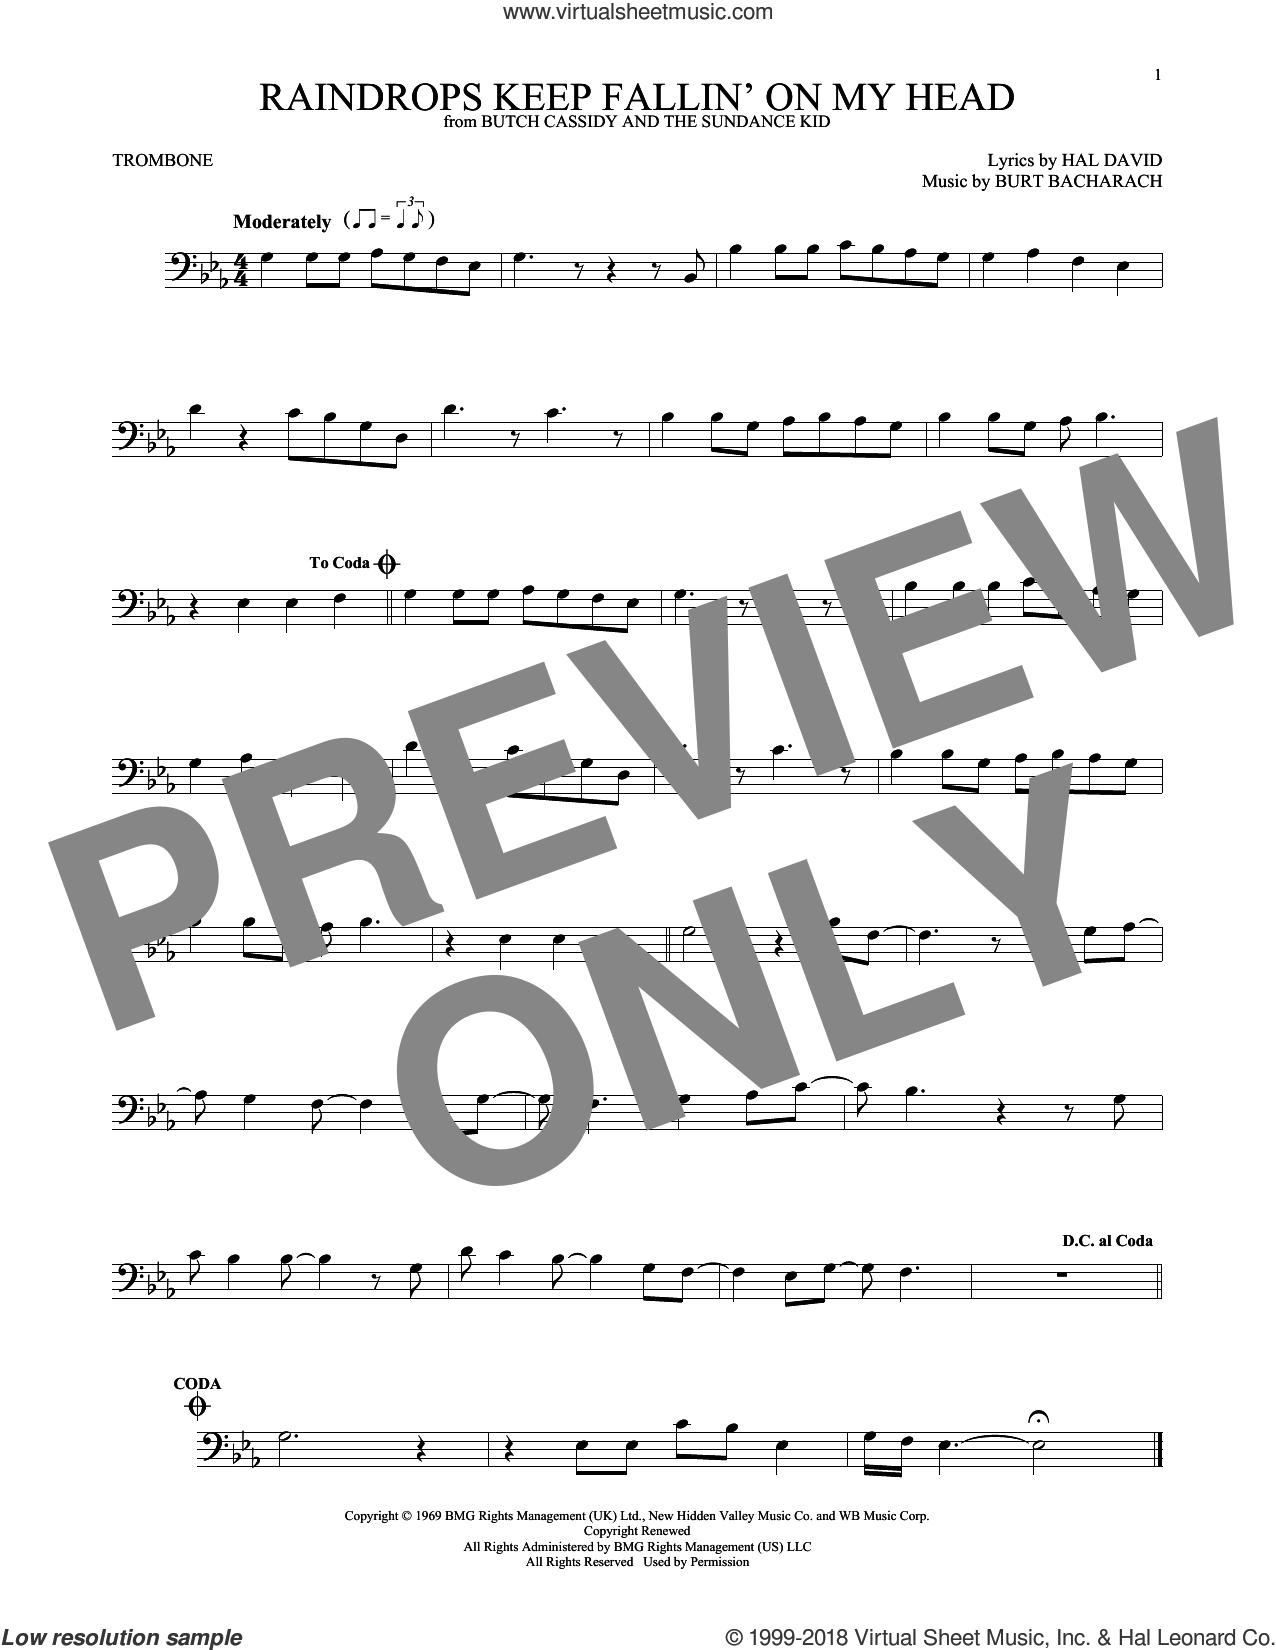 Raindrops Keep Fallin' On My Head sheet music for trombone solo by Burt Bacharach, B.J. Thomas and Hal David, intermediate skill level